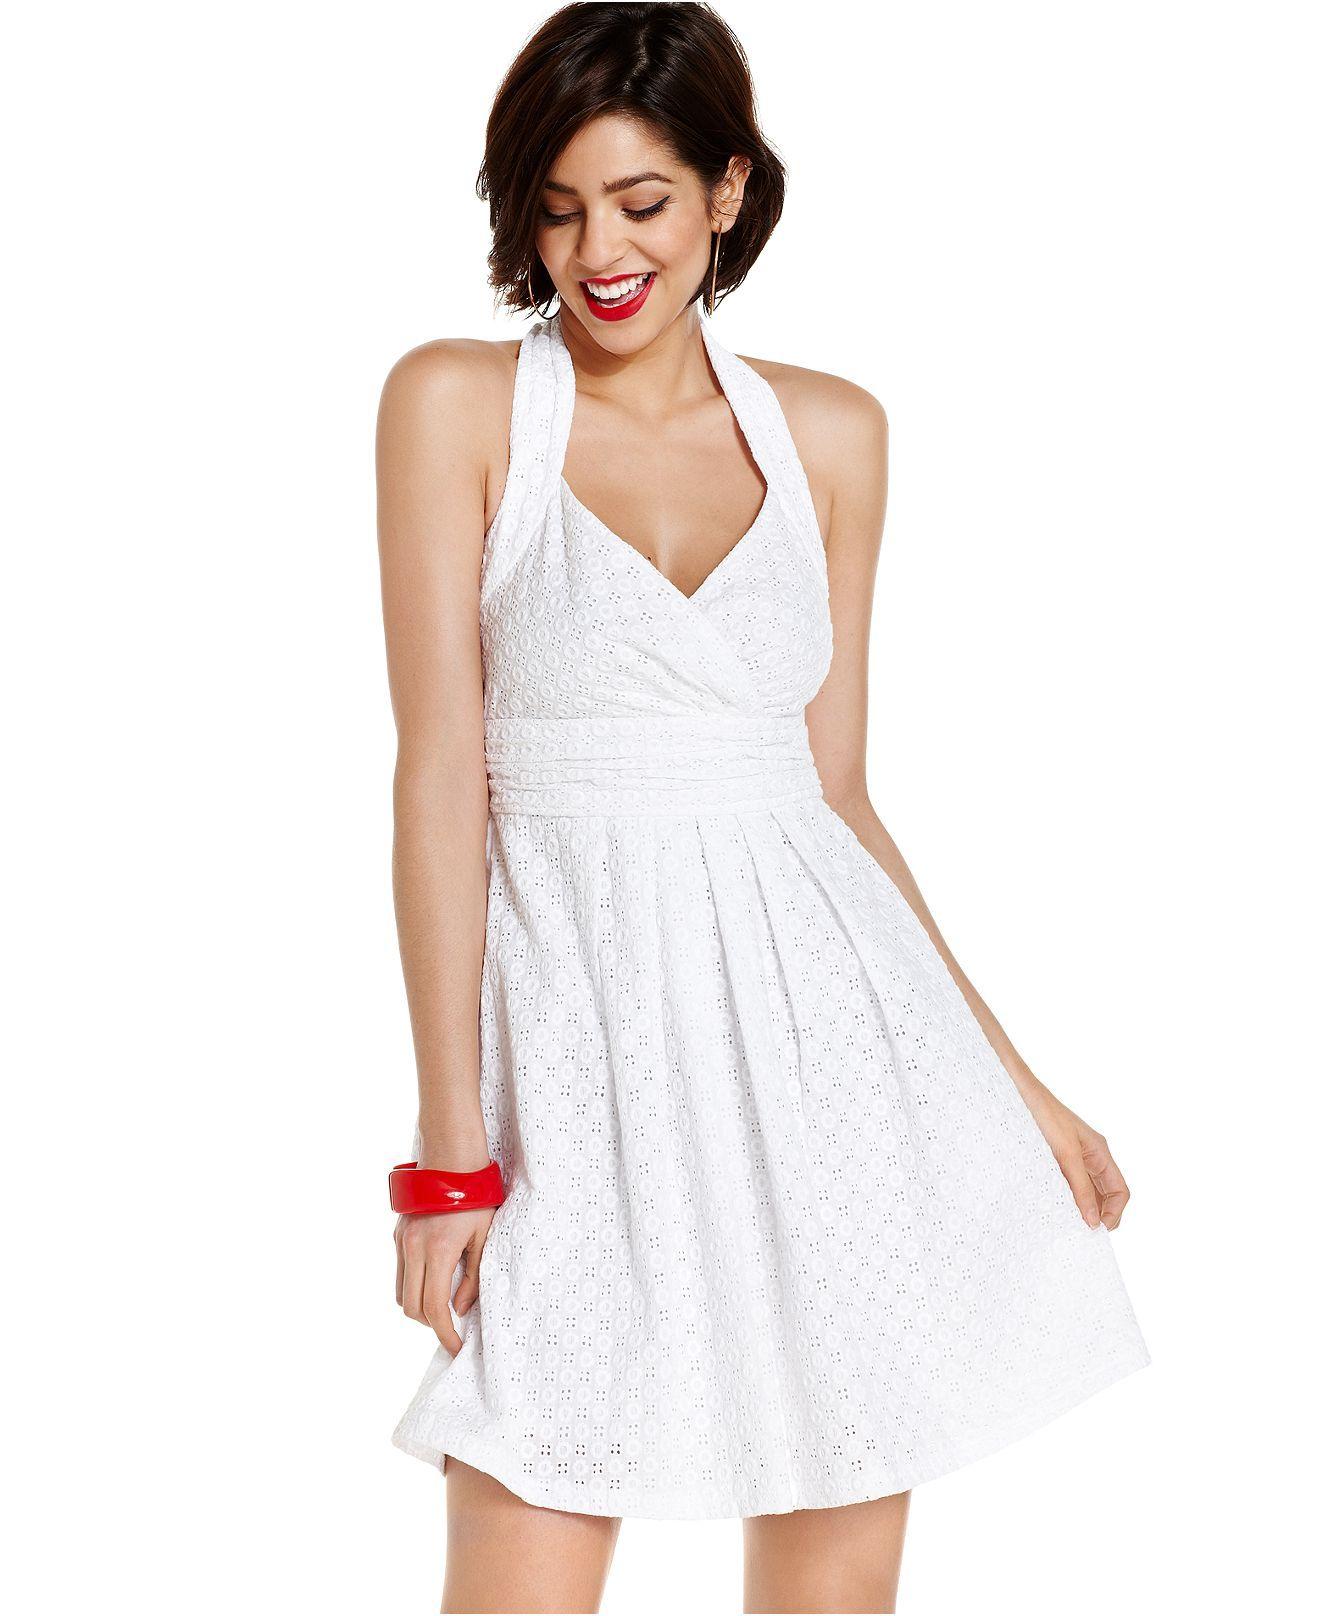 Marilyn Monroe Juniors Dress, Halter Eyelet-Lace A-Line - Juniors Dresses - Macys